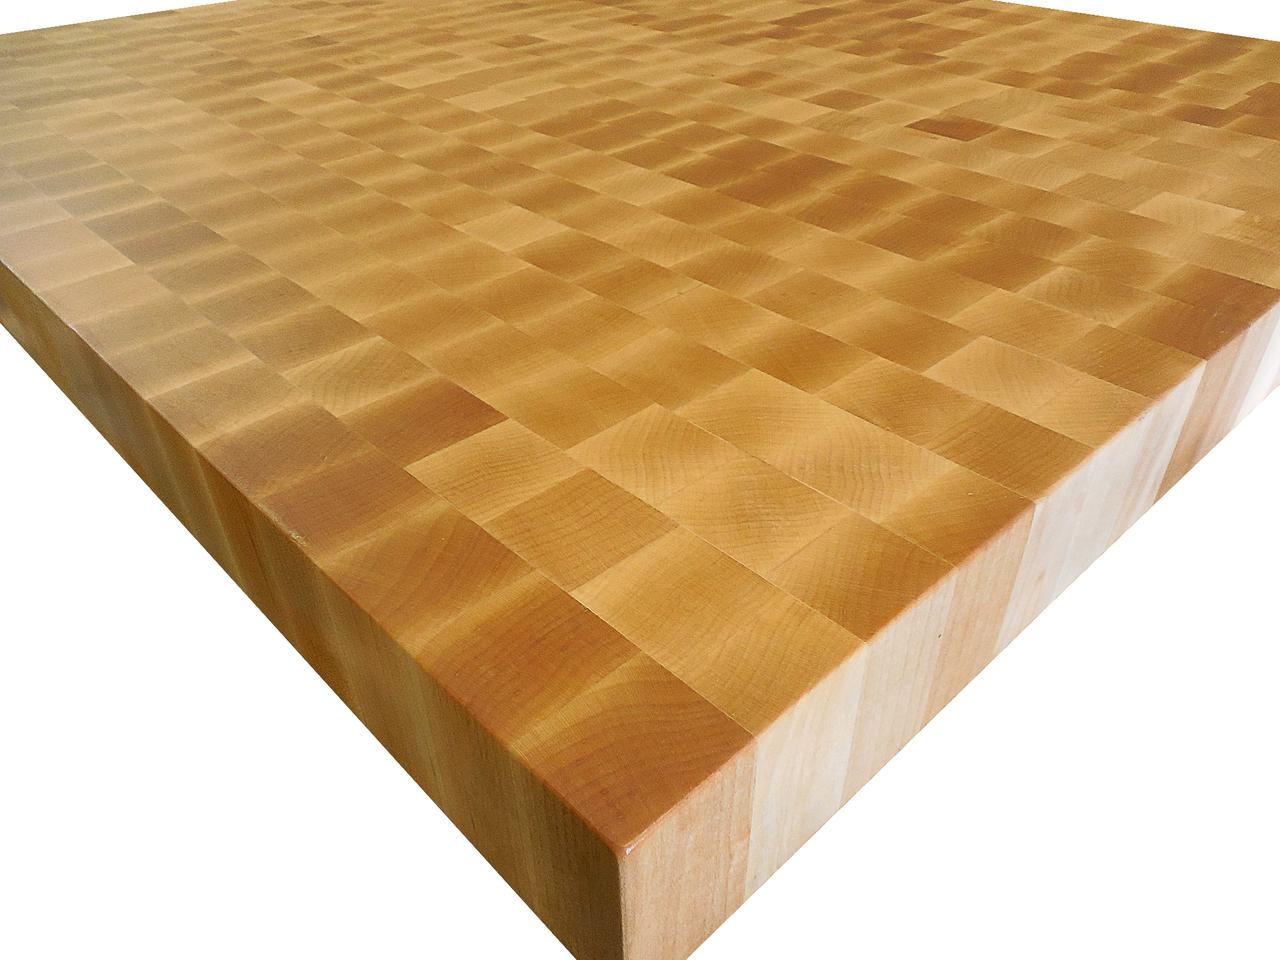 Armani Fine Woodworking End Grain Hard Rock Maple Countertop